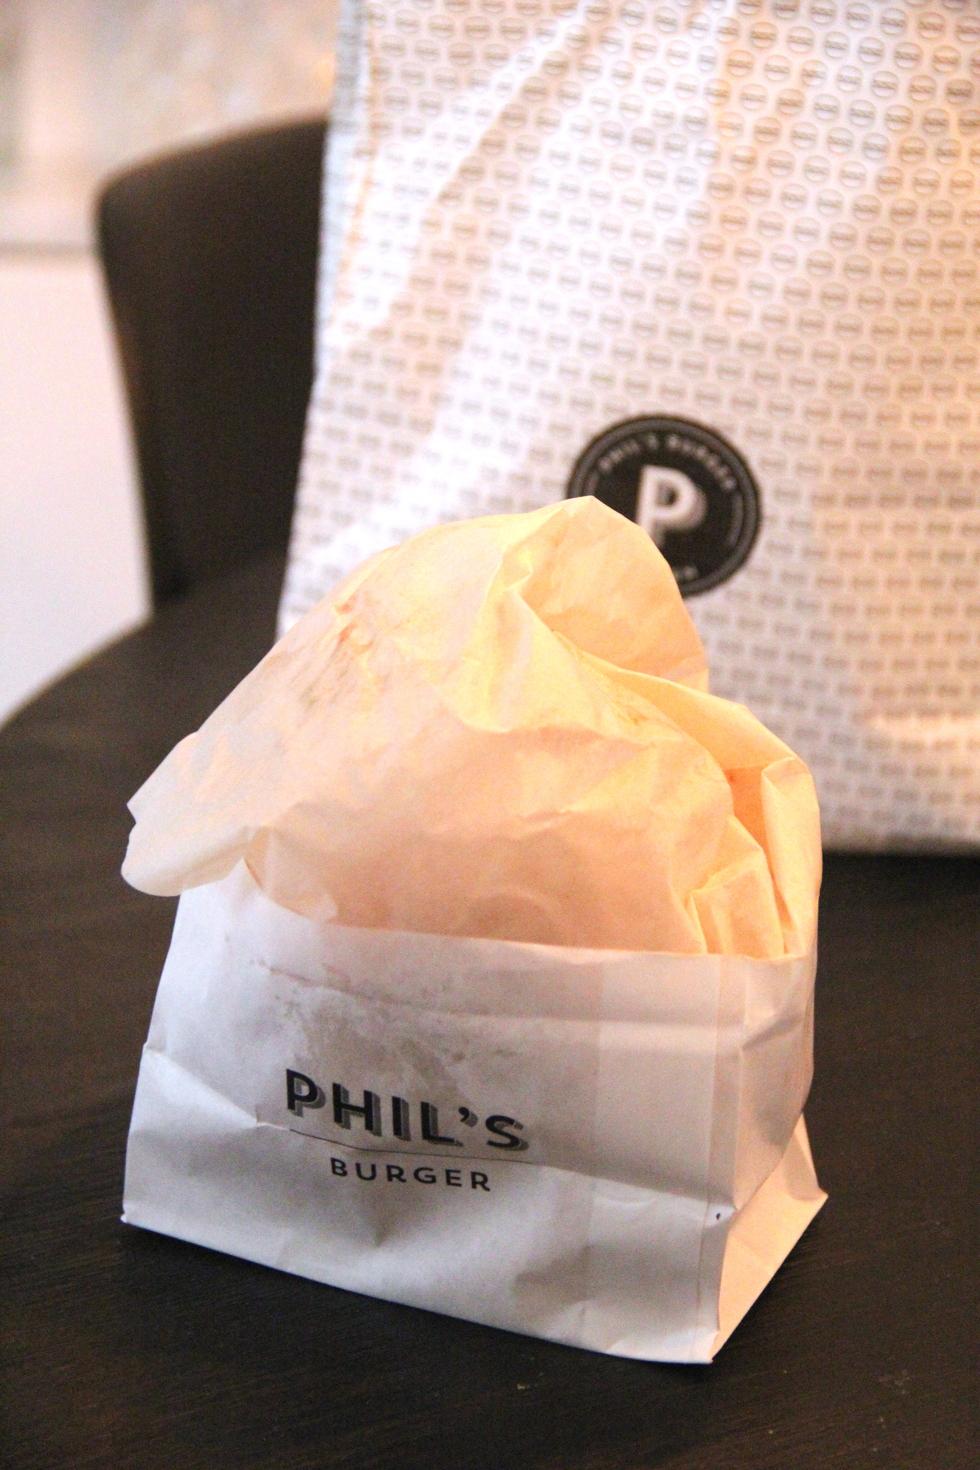 Phils Burger